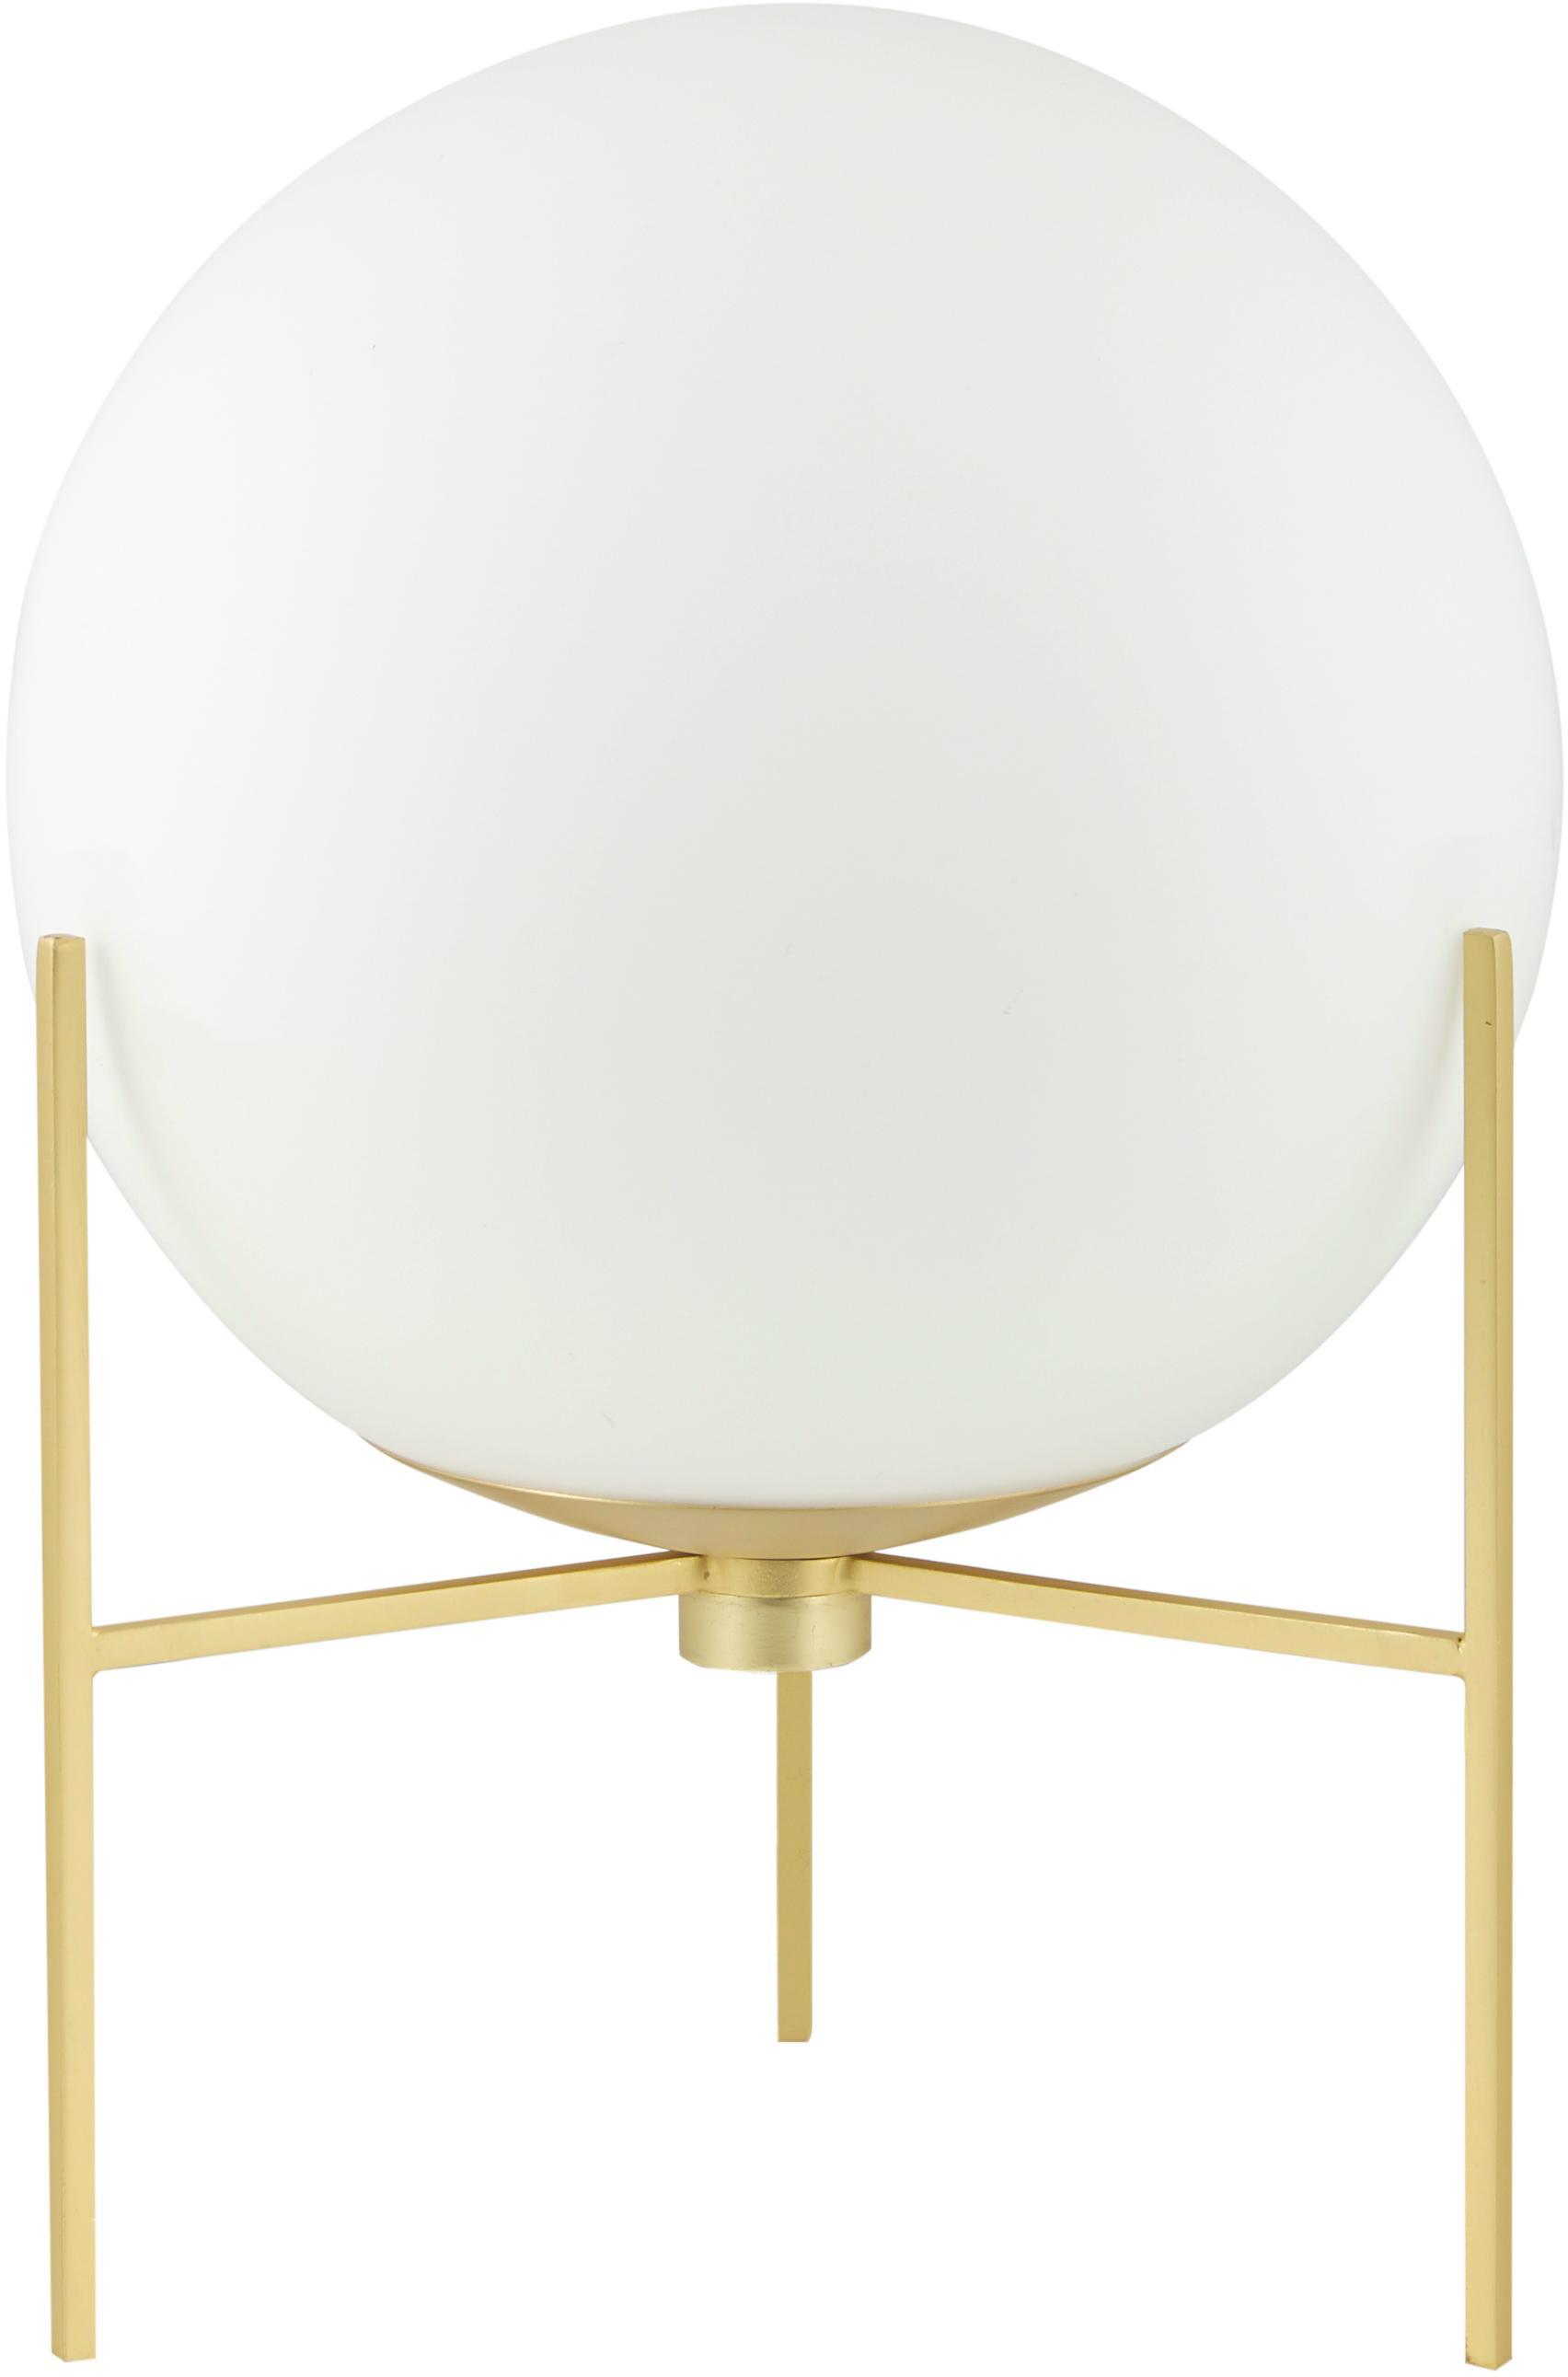 Tafellamp Alton van opaalglas, Lampvoet: messing, Diffuser: opaalglas, Messingkleurig, wit, Ø 20 x H 29 cm